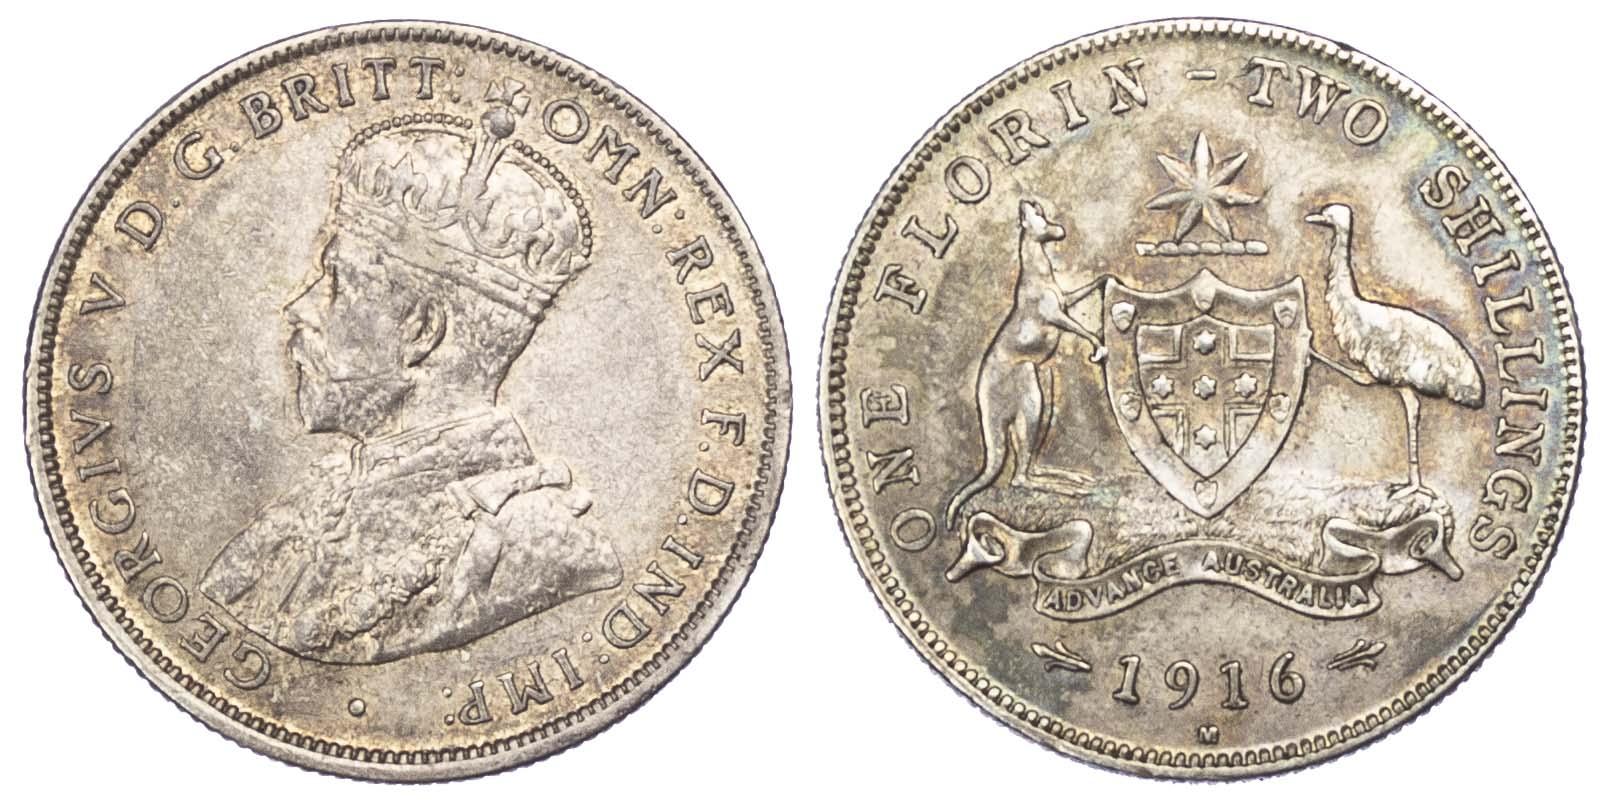 Australia, George V, Florin, 1916 M